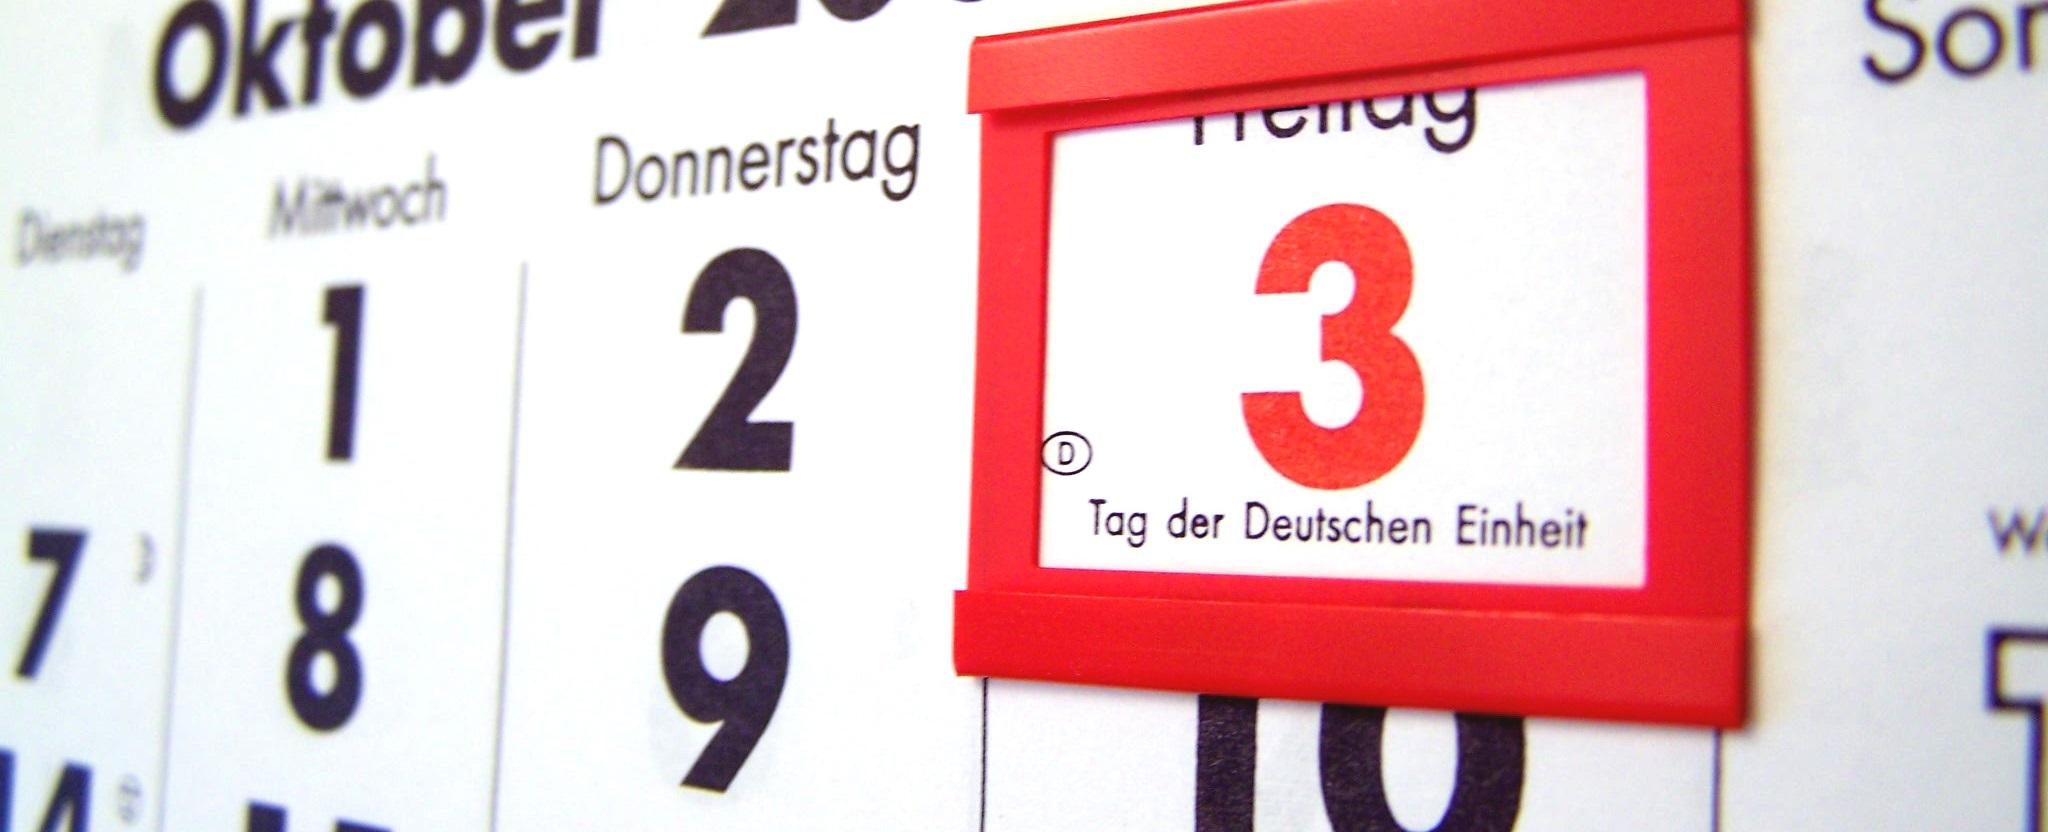 Kalender zeigt den 3. Oktober